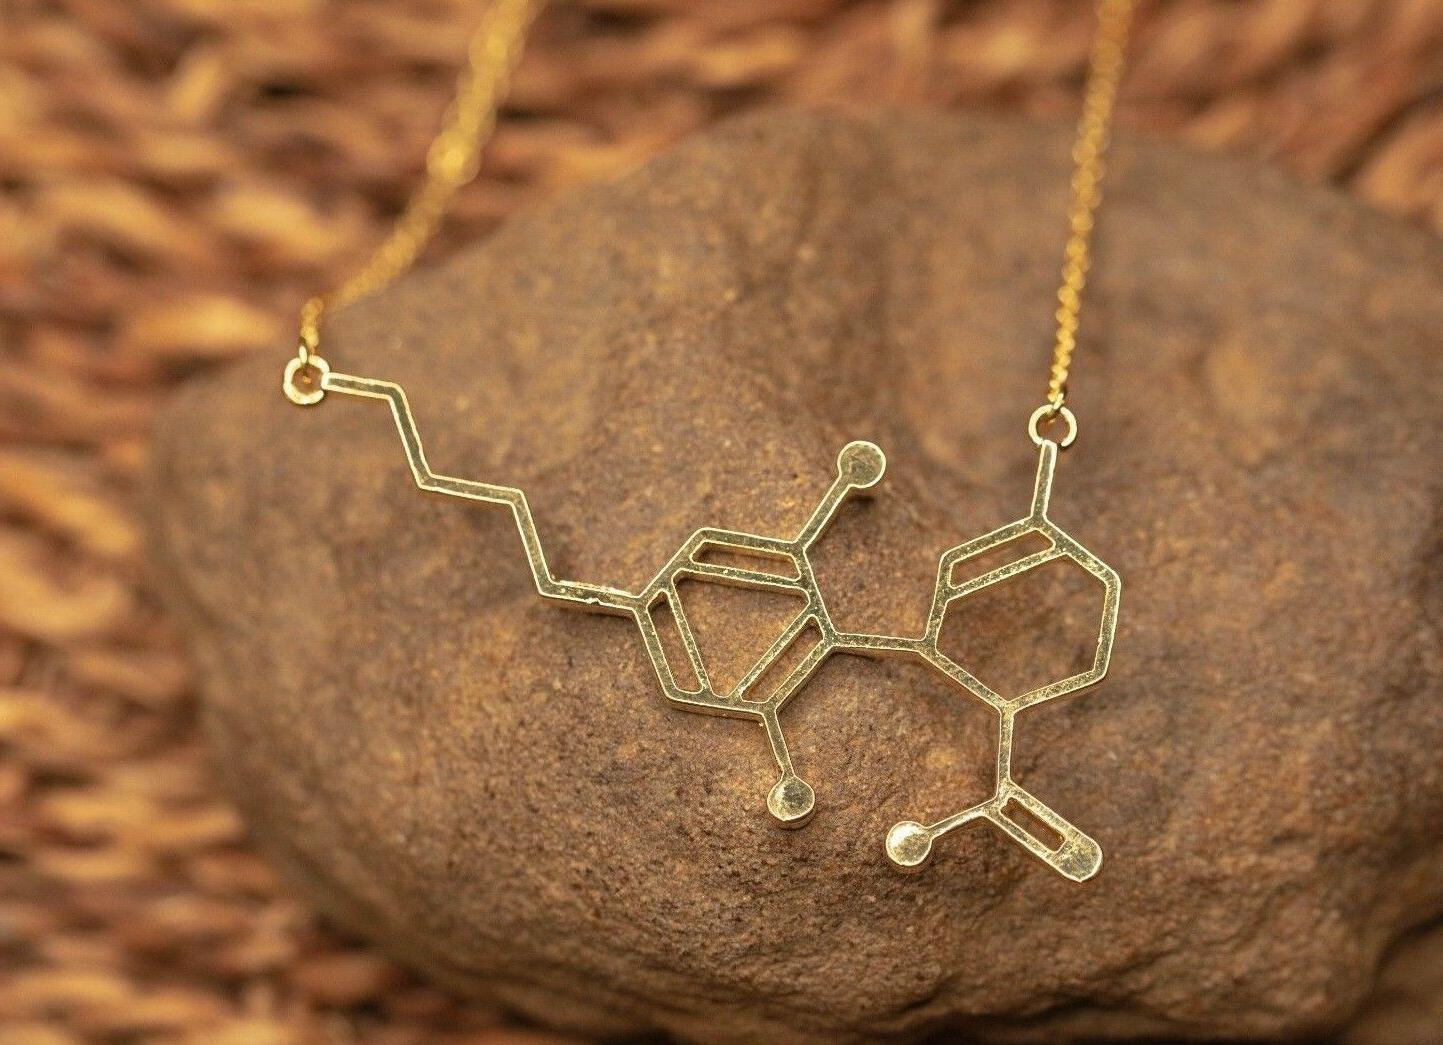 CBD Pendant Necklace | Women's Nerdy Gift For